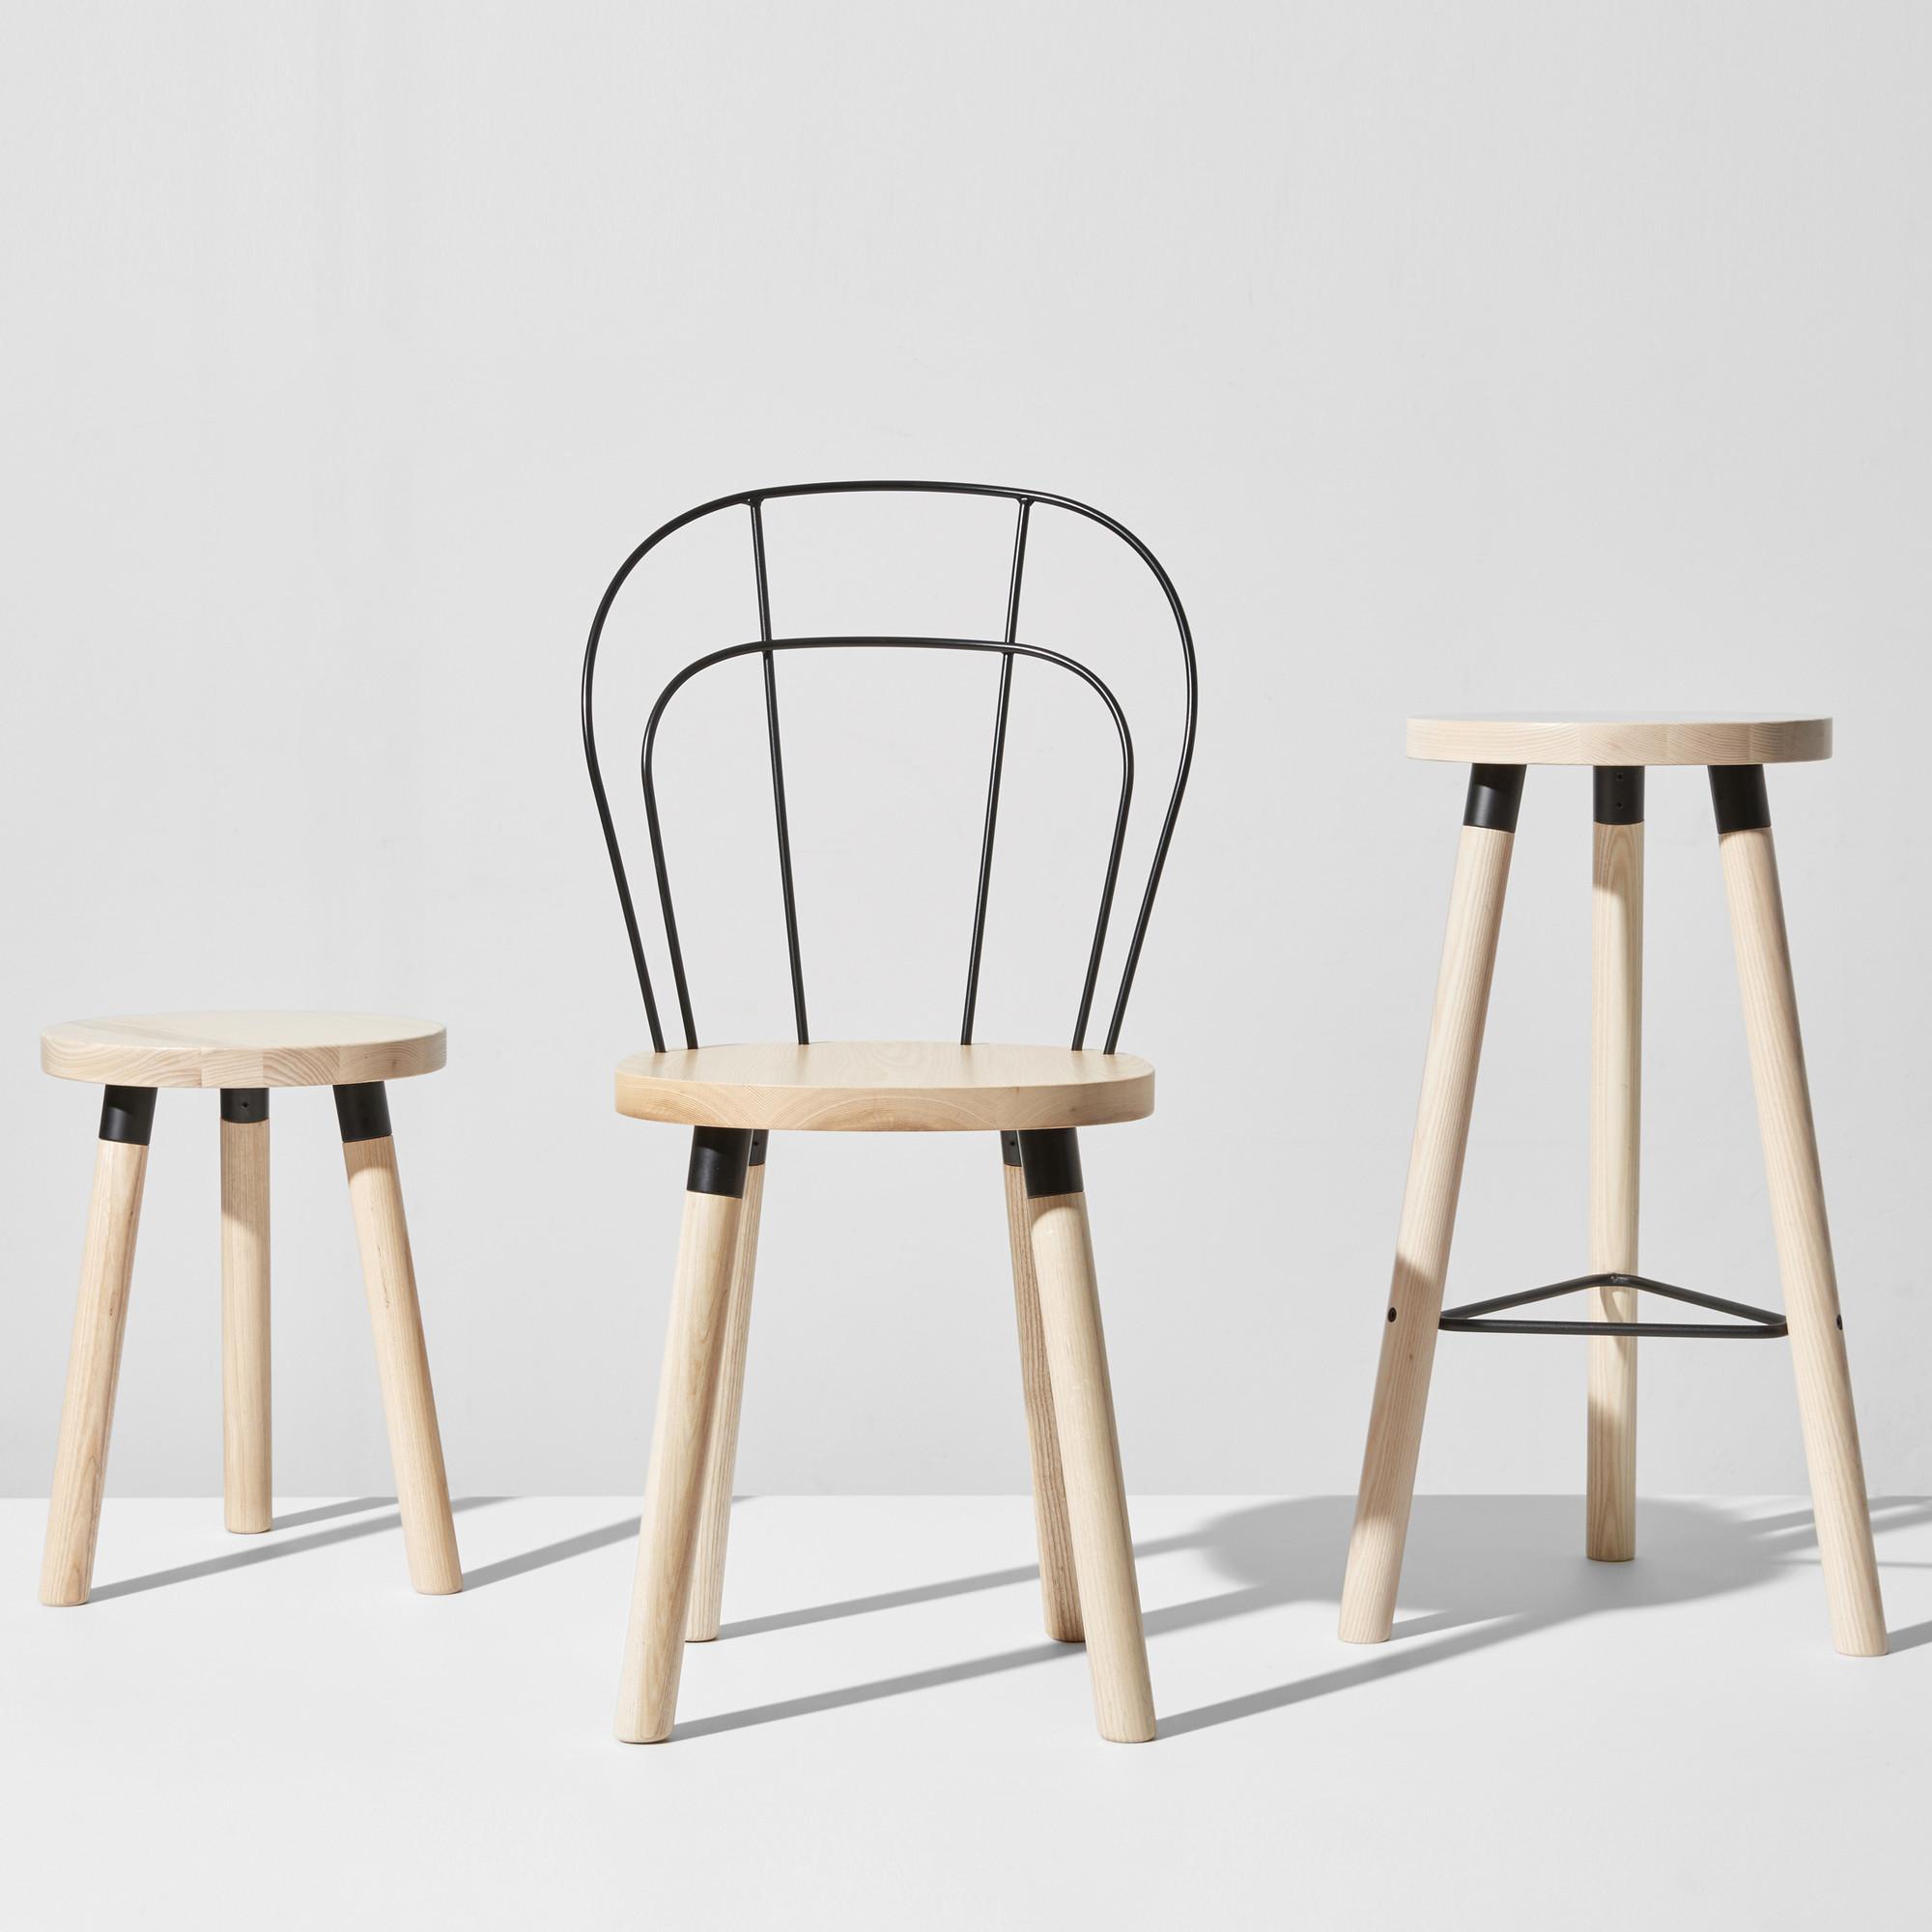 Silla Partridge / Designbythem, Cortesia de Designbythem